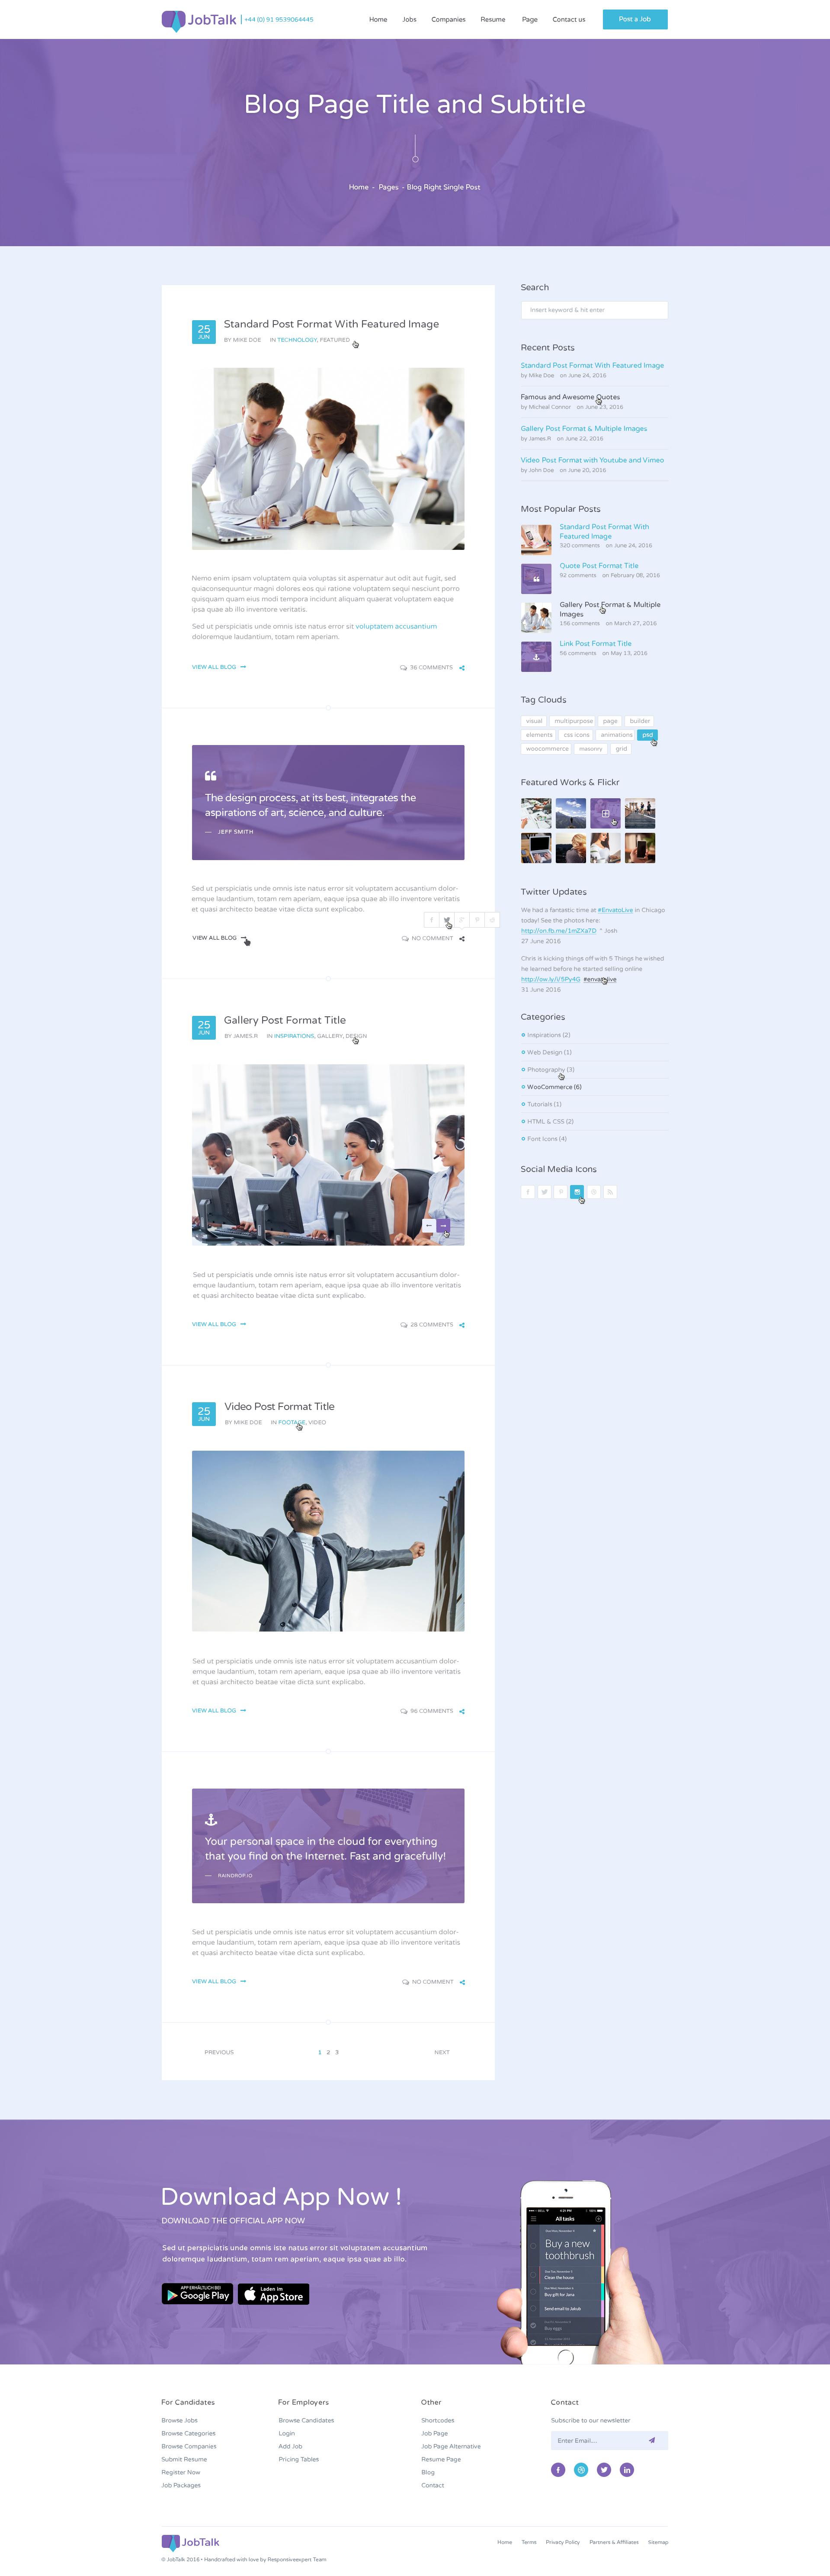 jobtalk job board psd template by themelexus themeforest jobtalk job board psd template